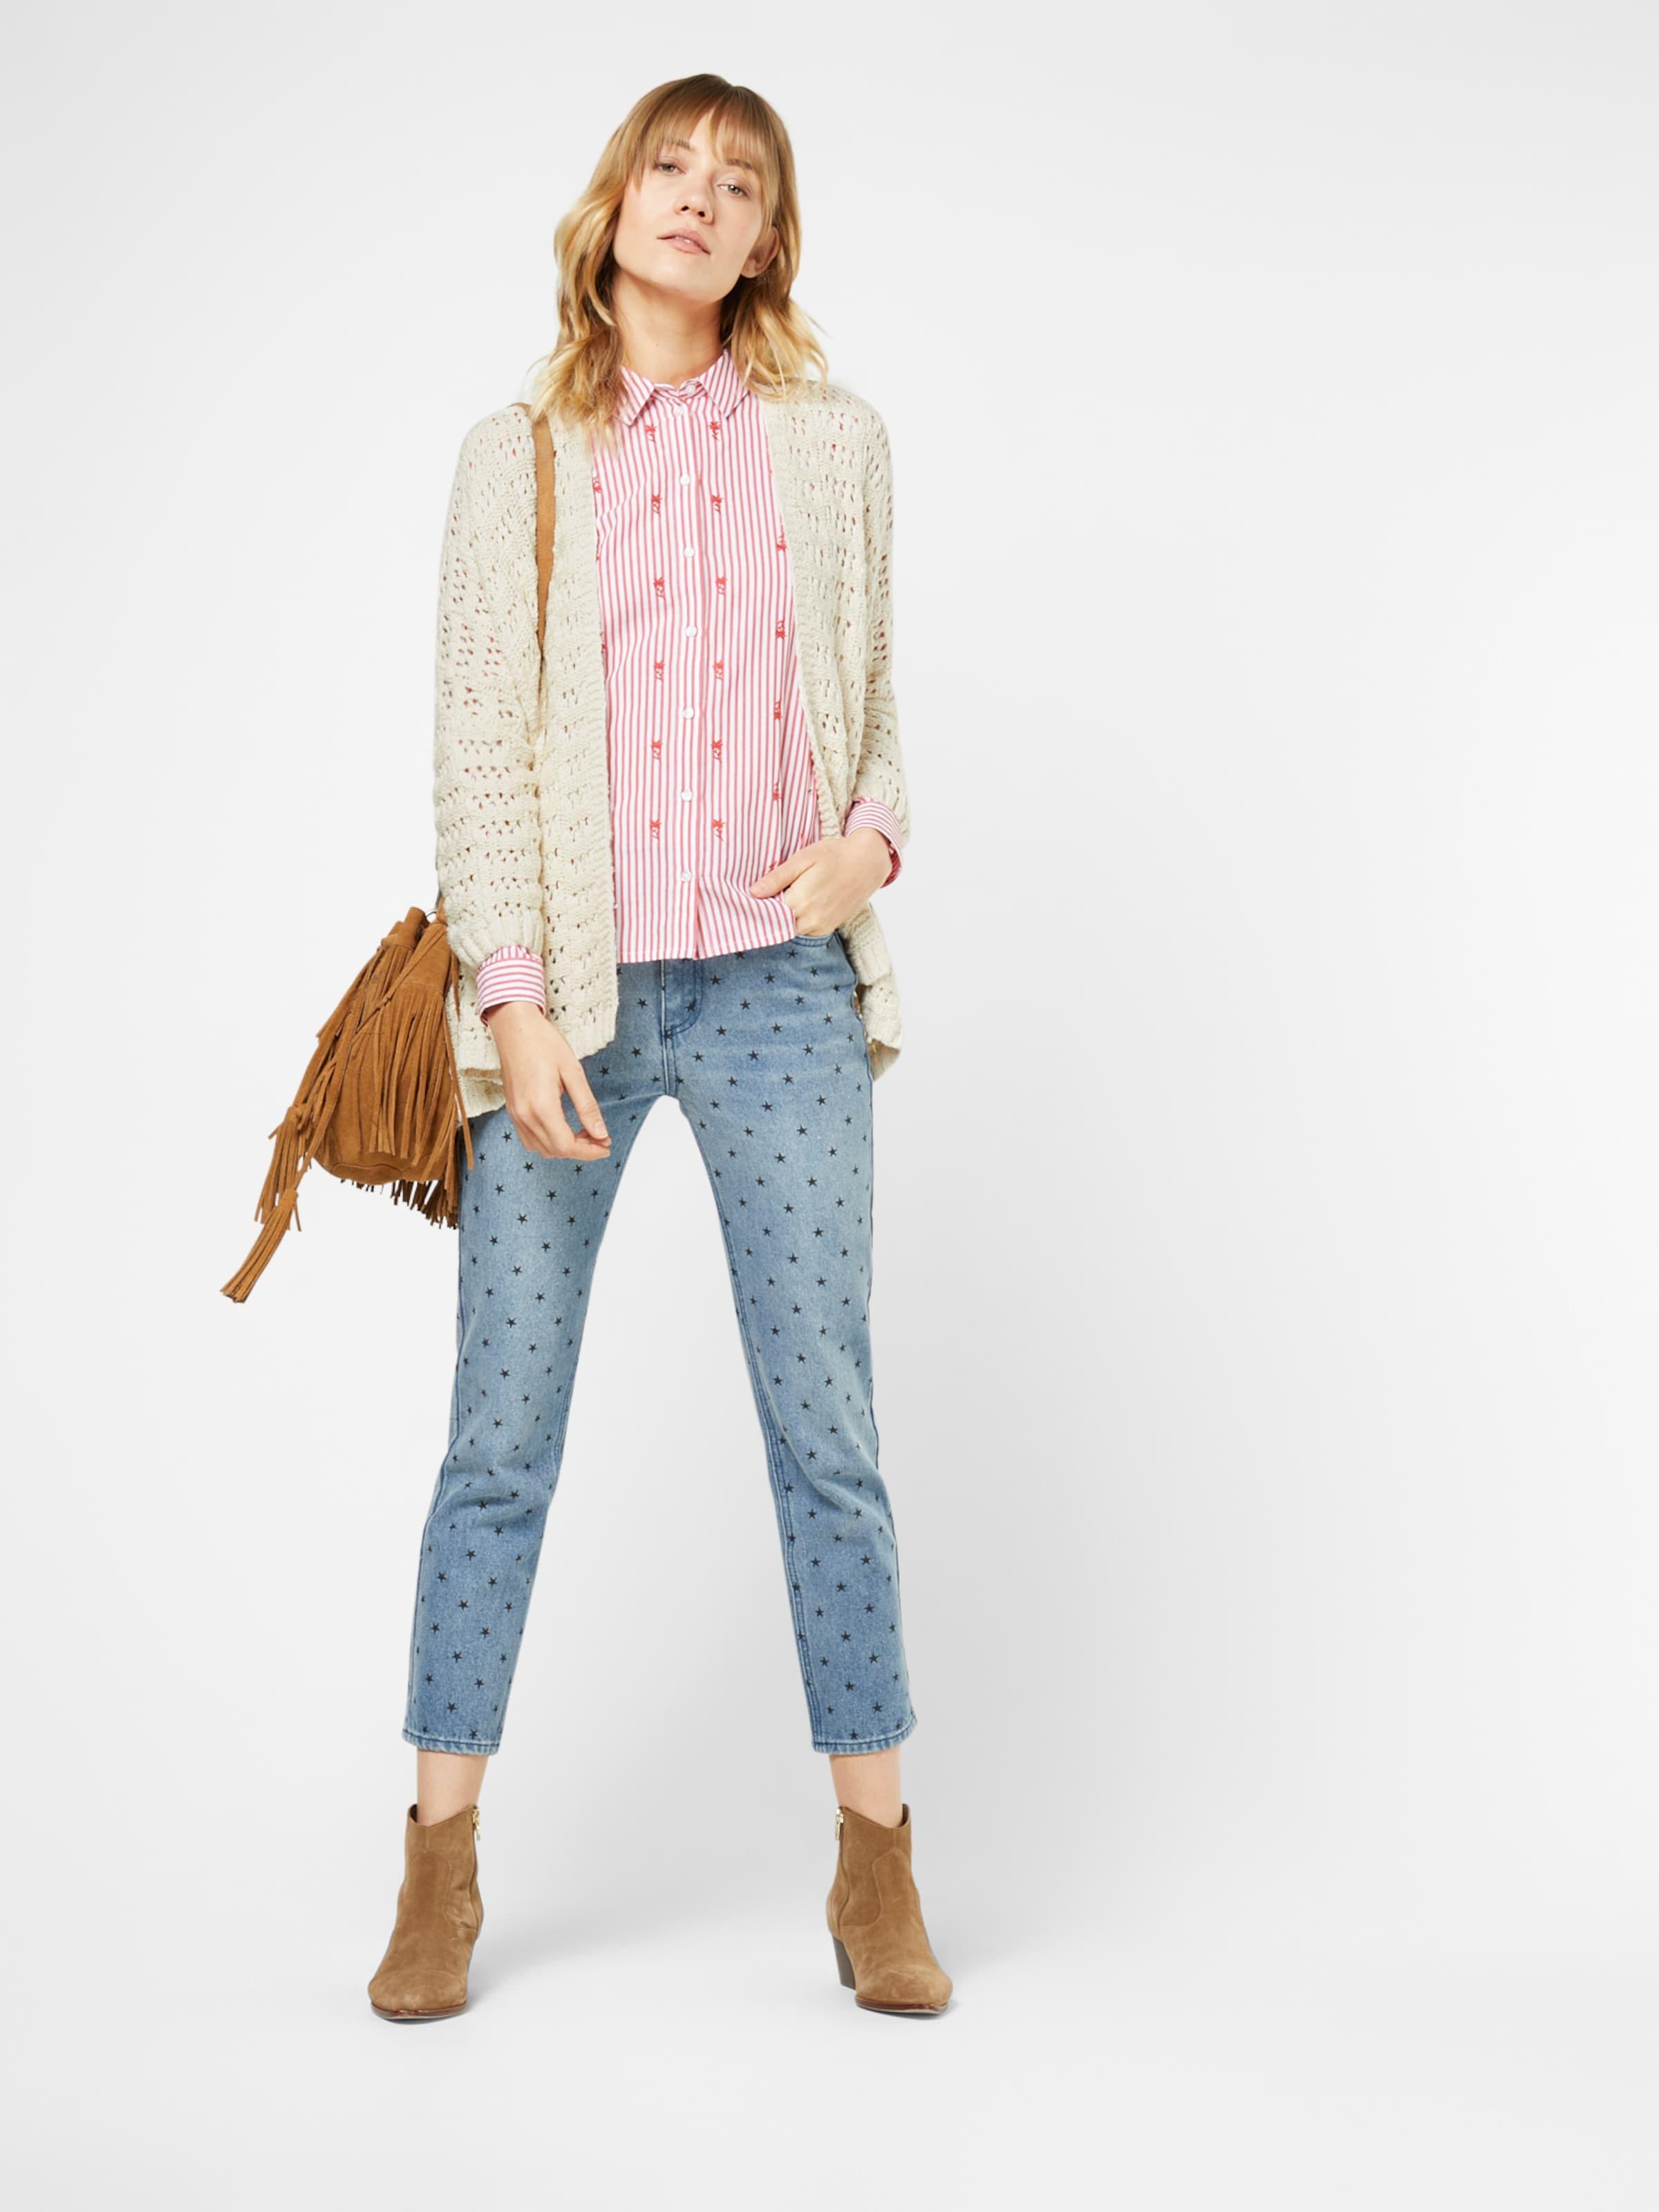 Pepe Jeans Strickjacke 'FLORA' Neueste Online-Verkauf NrsFJ